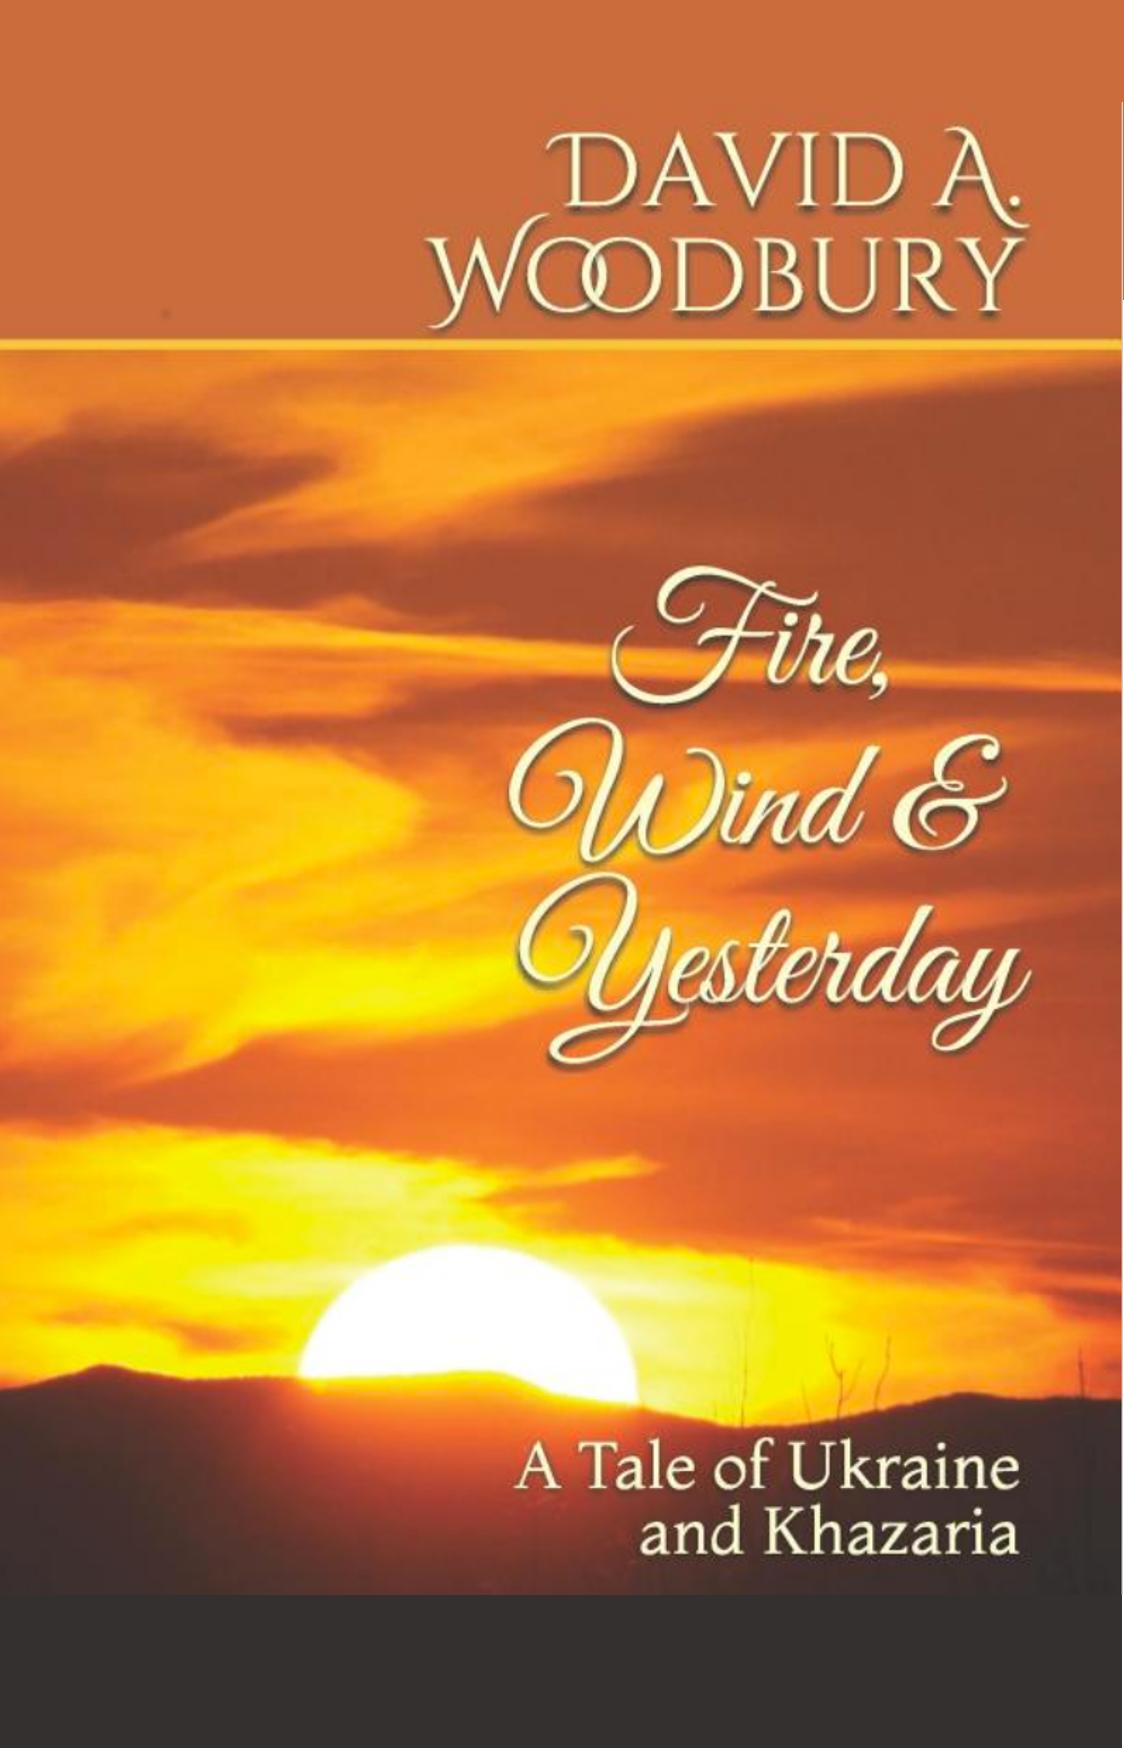 Fire, Wind & Yesterday